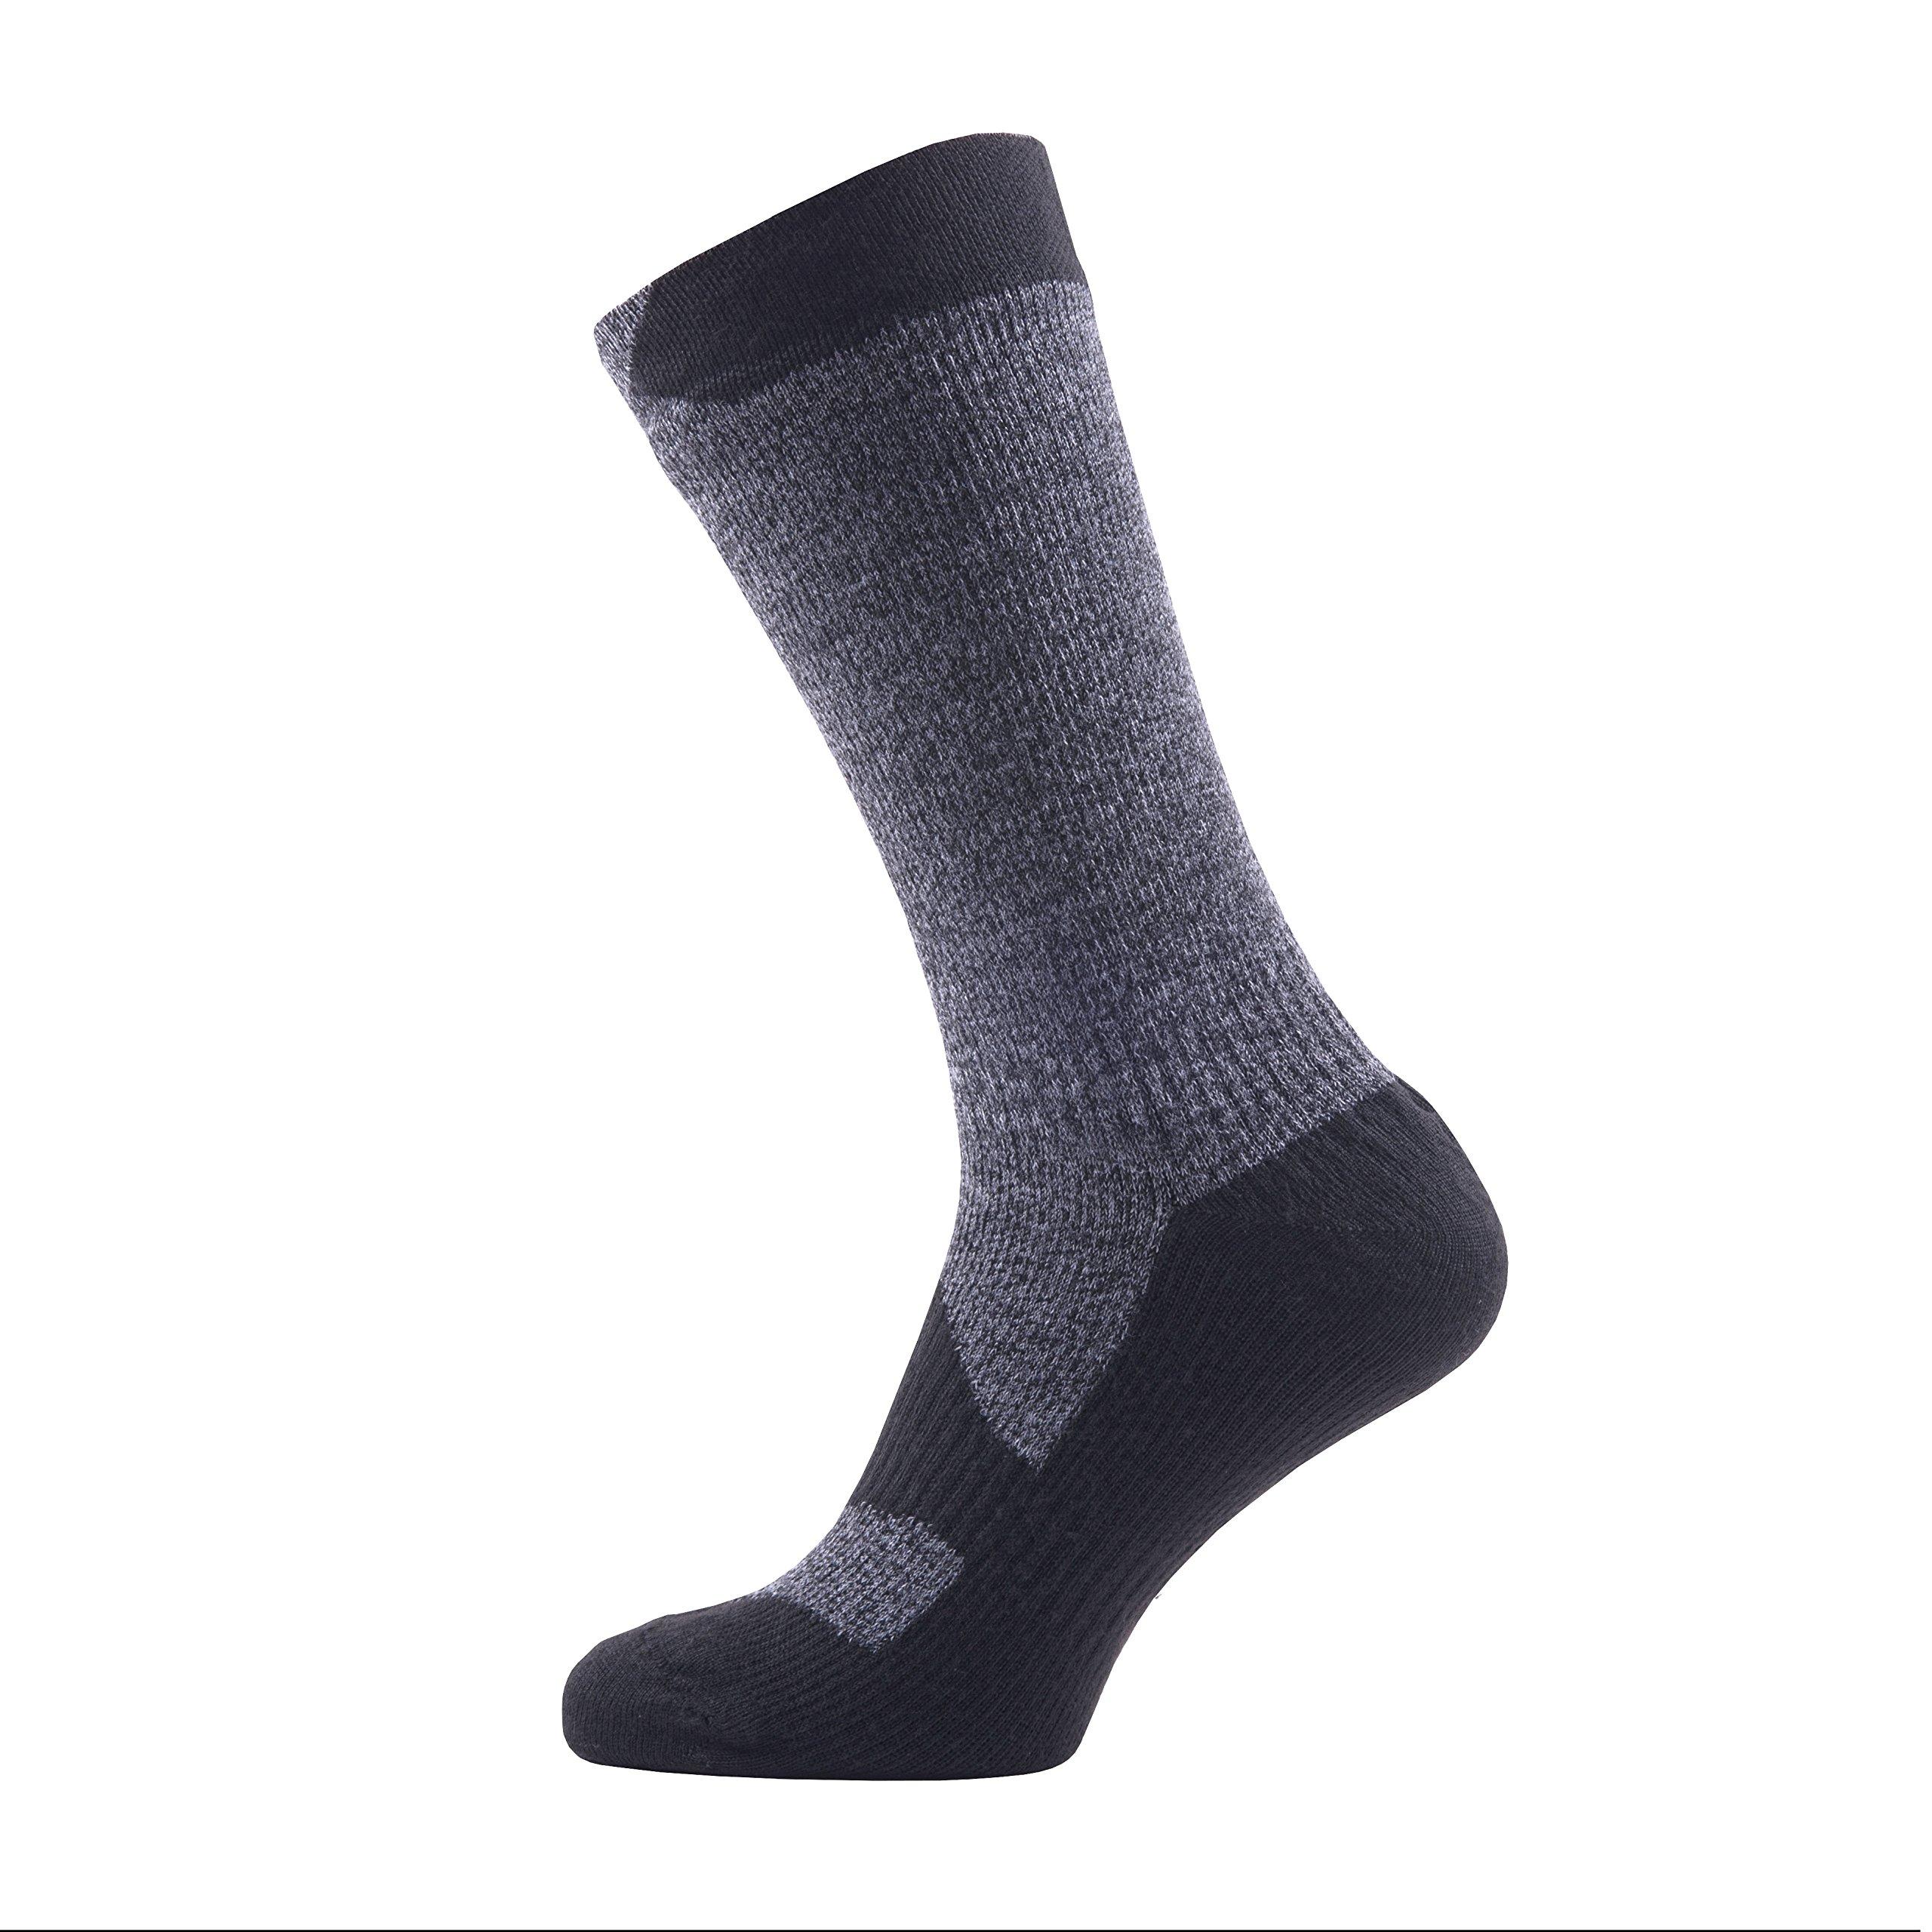 SealSkinz Walking Thin Mid socks, Small - Dark Grey Marl/Black. With a Helicase brand sock ring